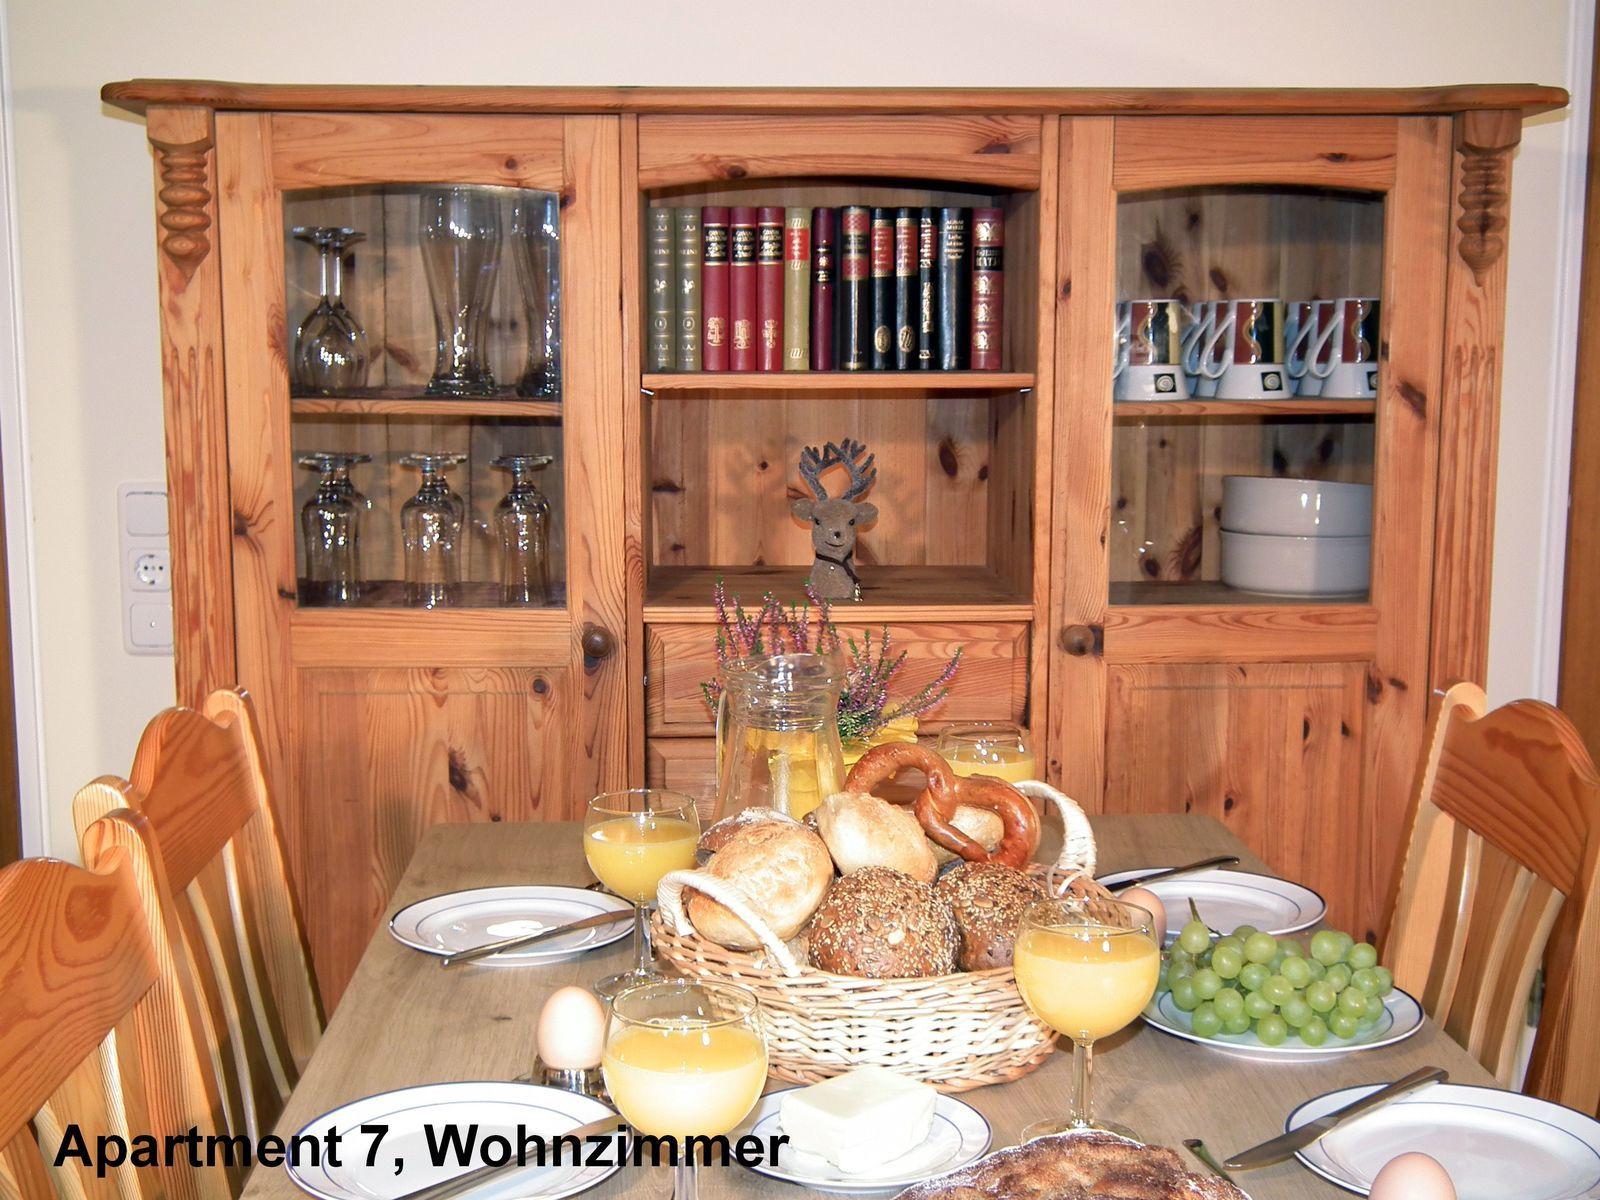 Appartement - Haus Merian 7 | Winterberg